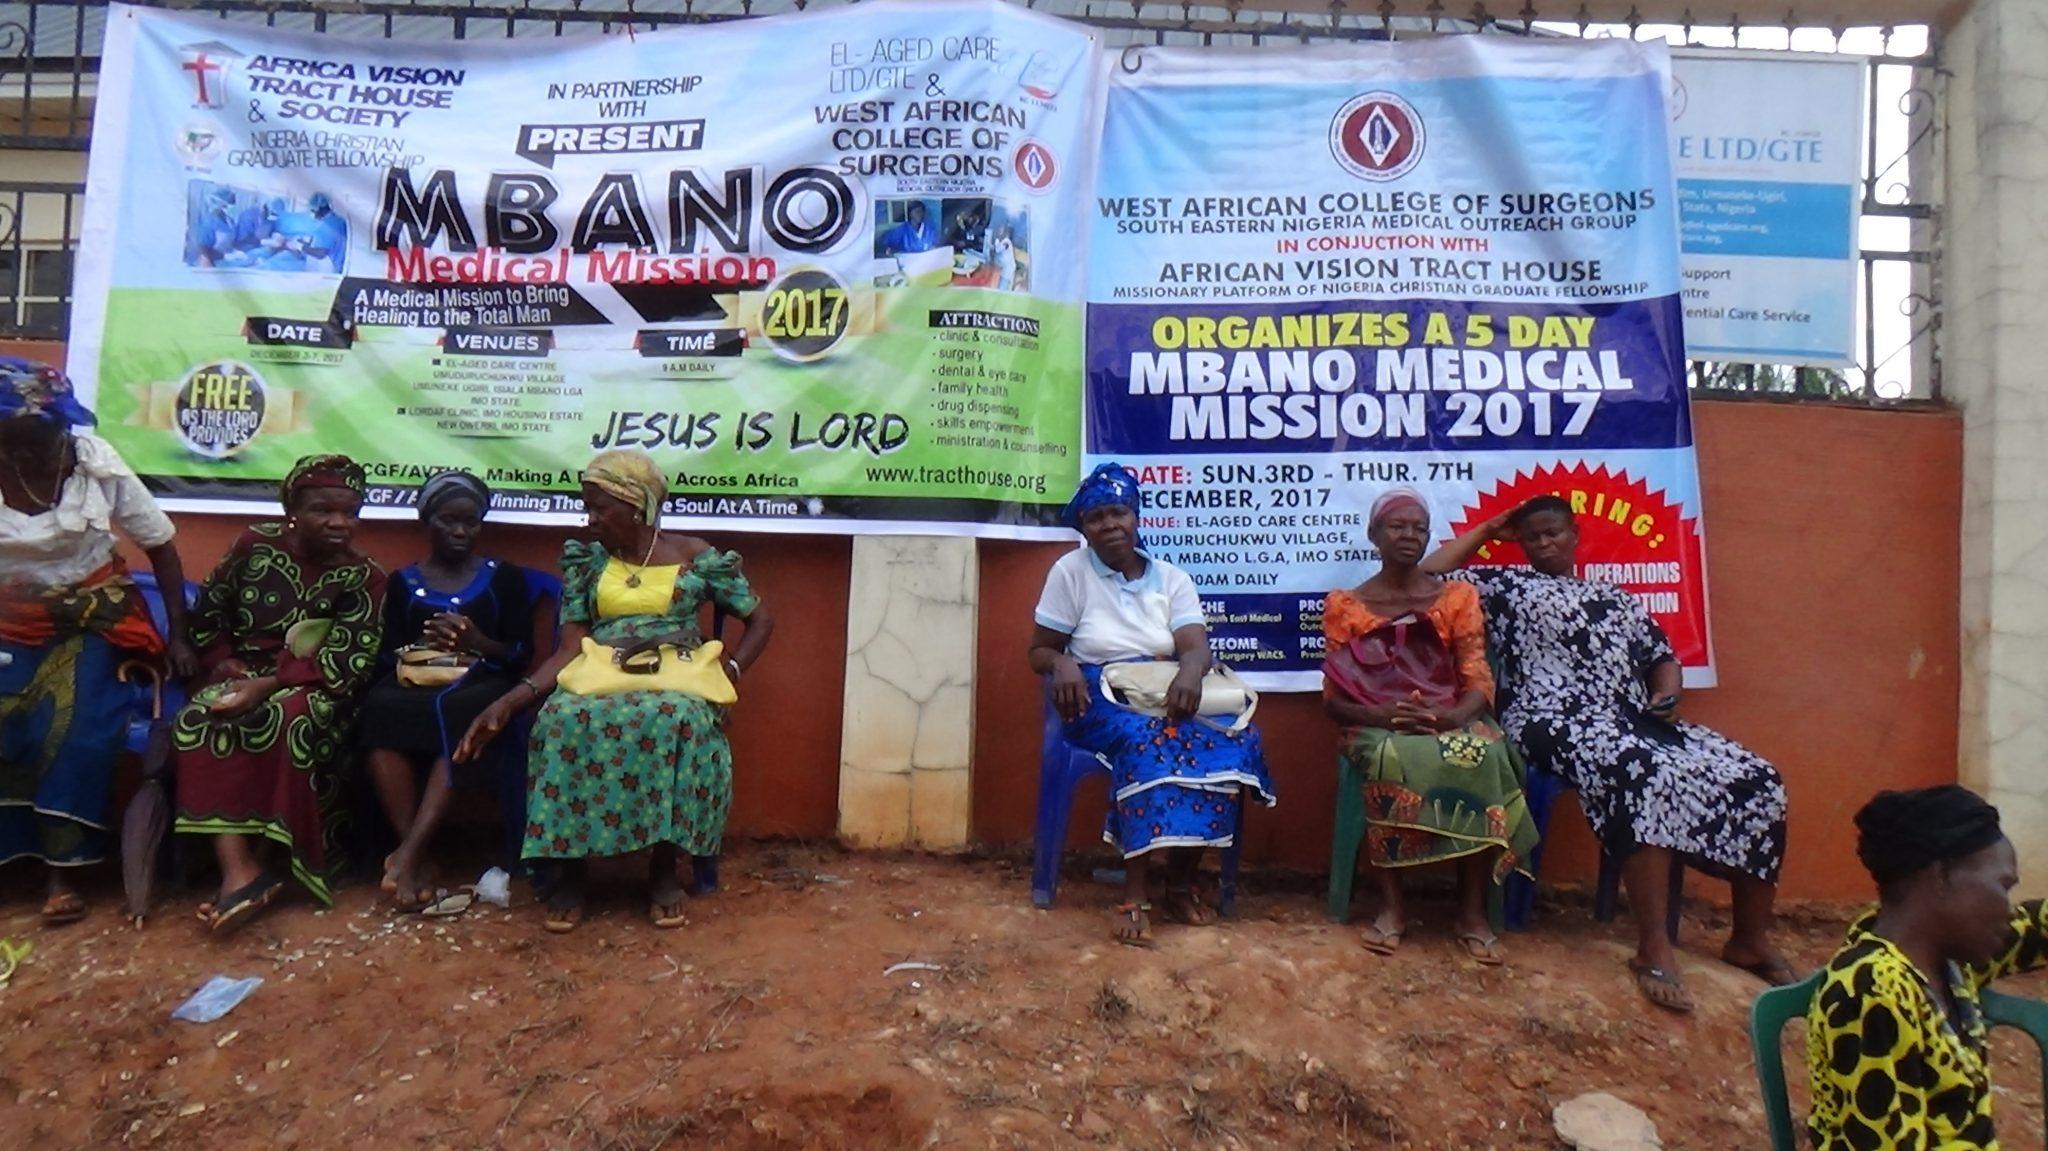 At The Mbano Medical Mission 2017